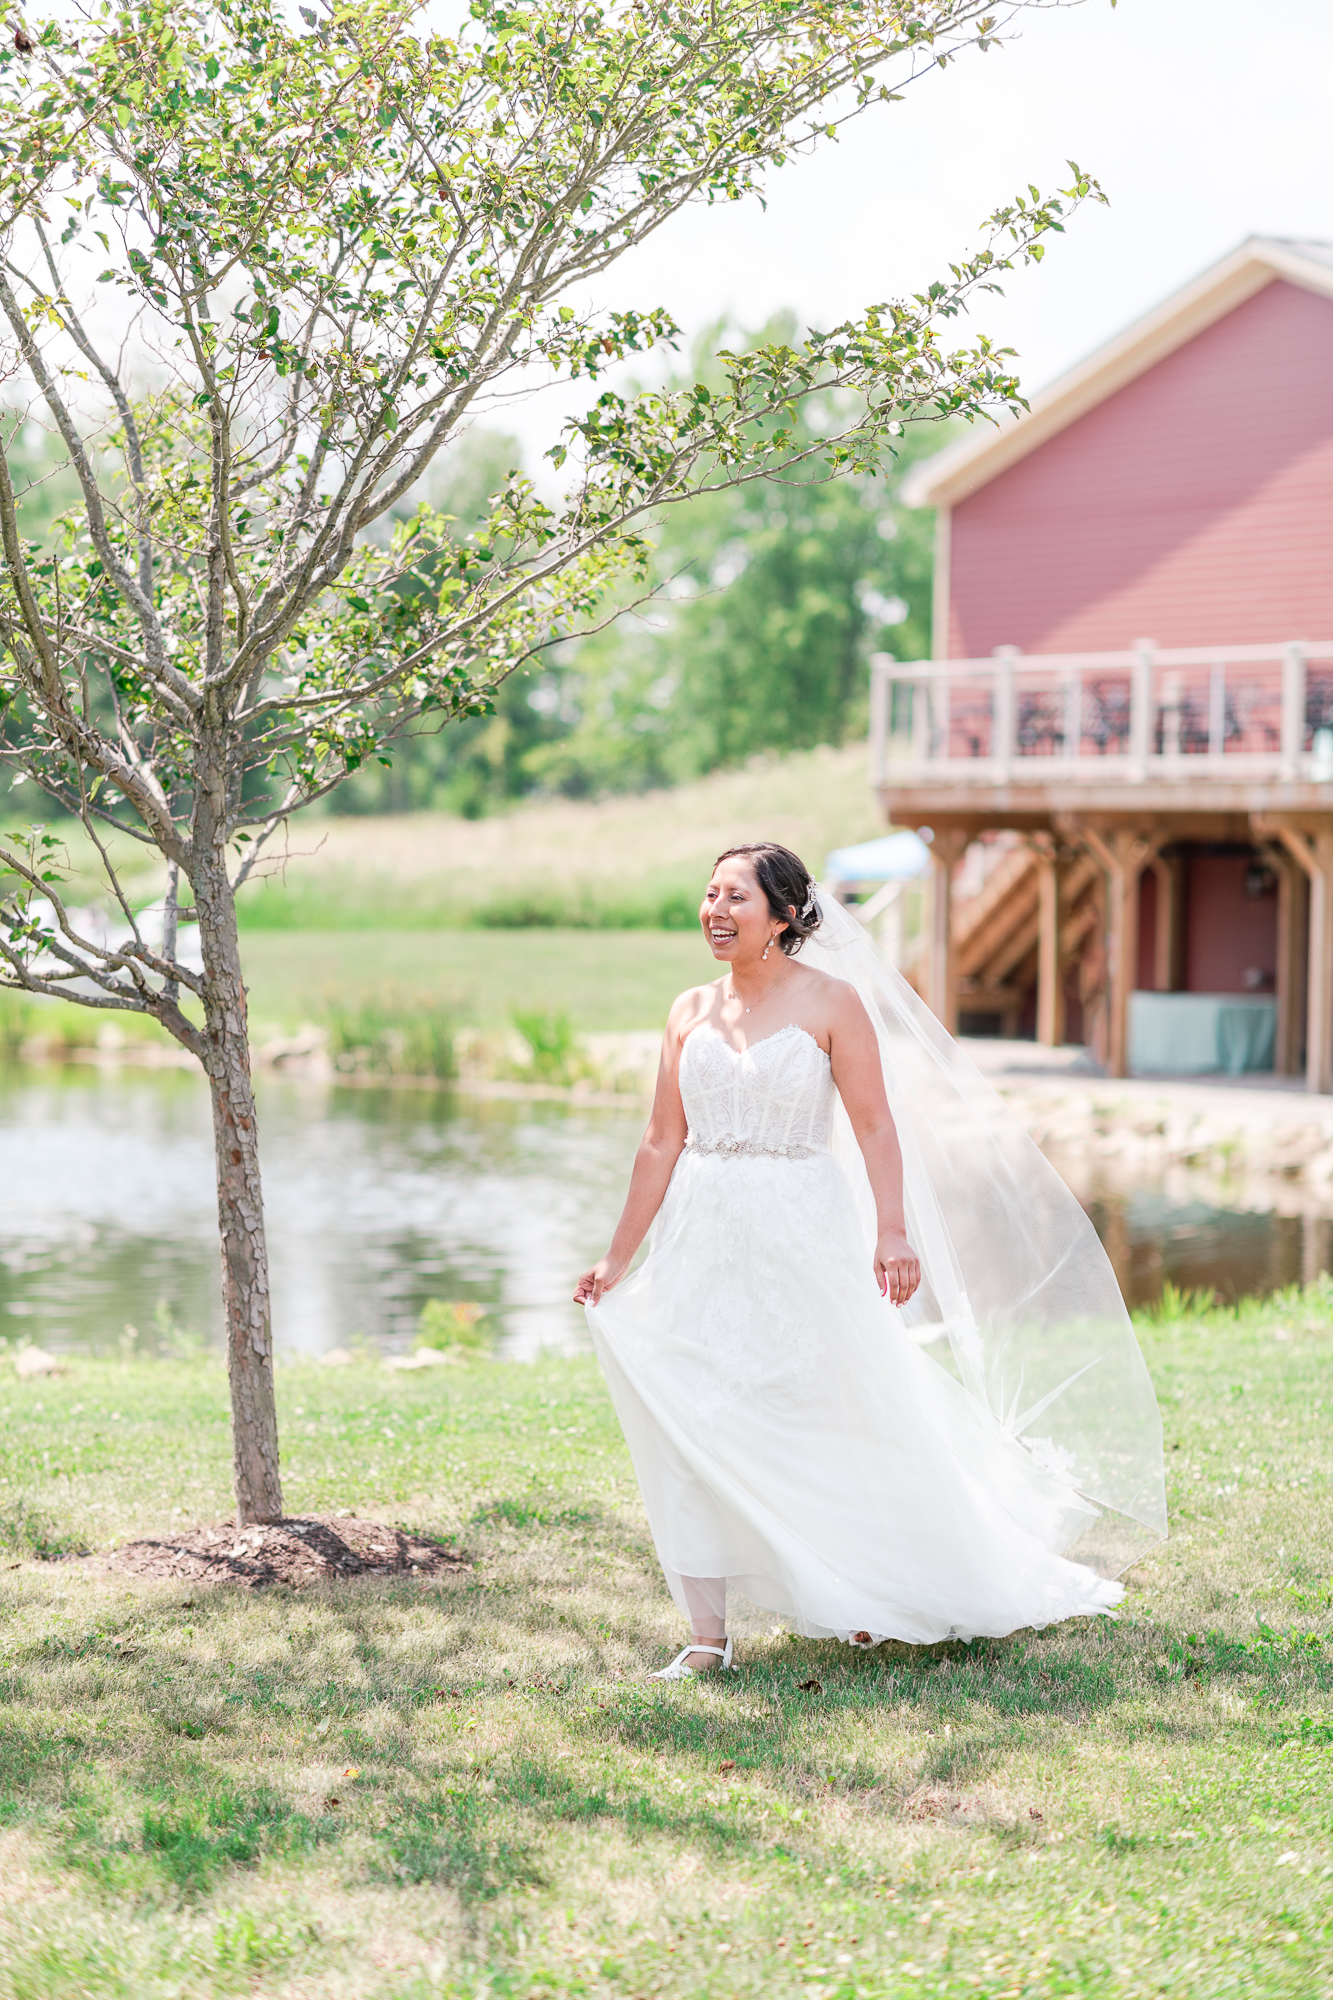 Maria+Adam_Summer Barn Wedding_The Barn at The North Star Preserve_Oberlin_Ohio-75.jpg